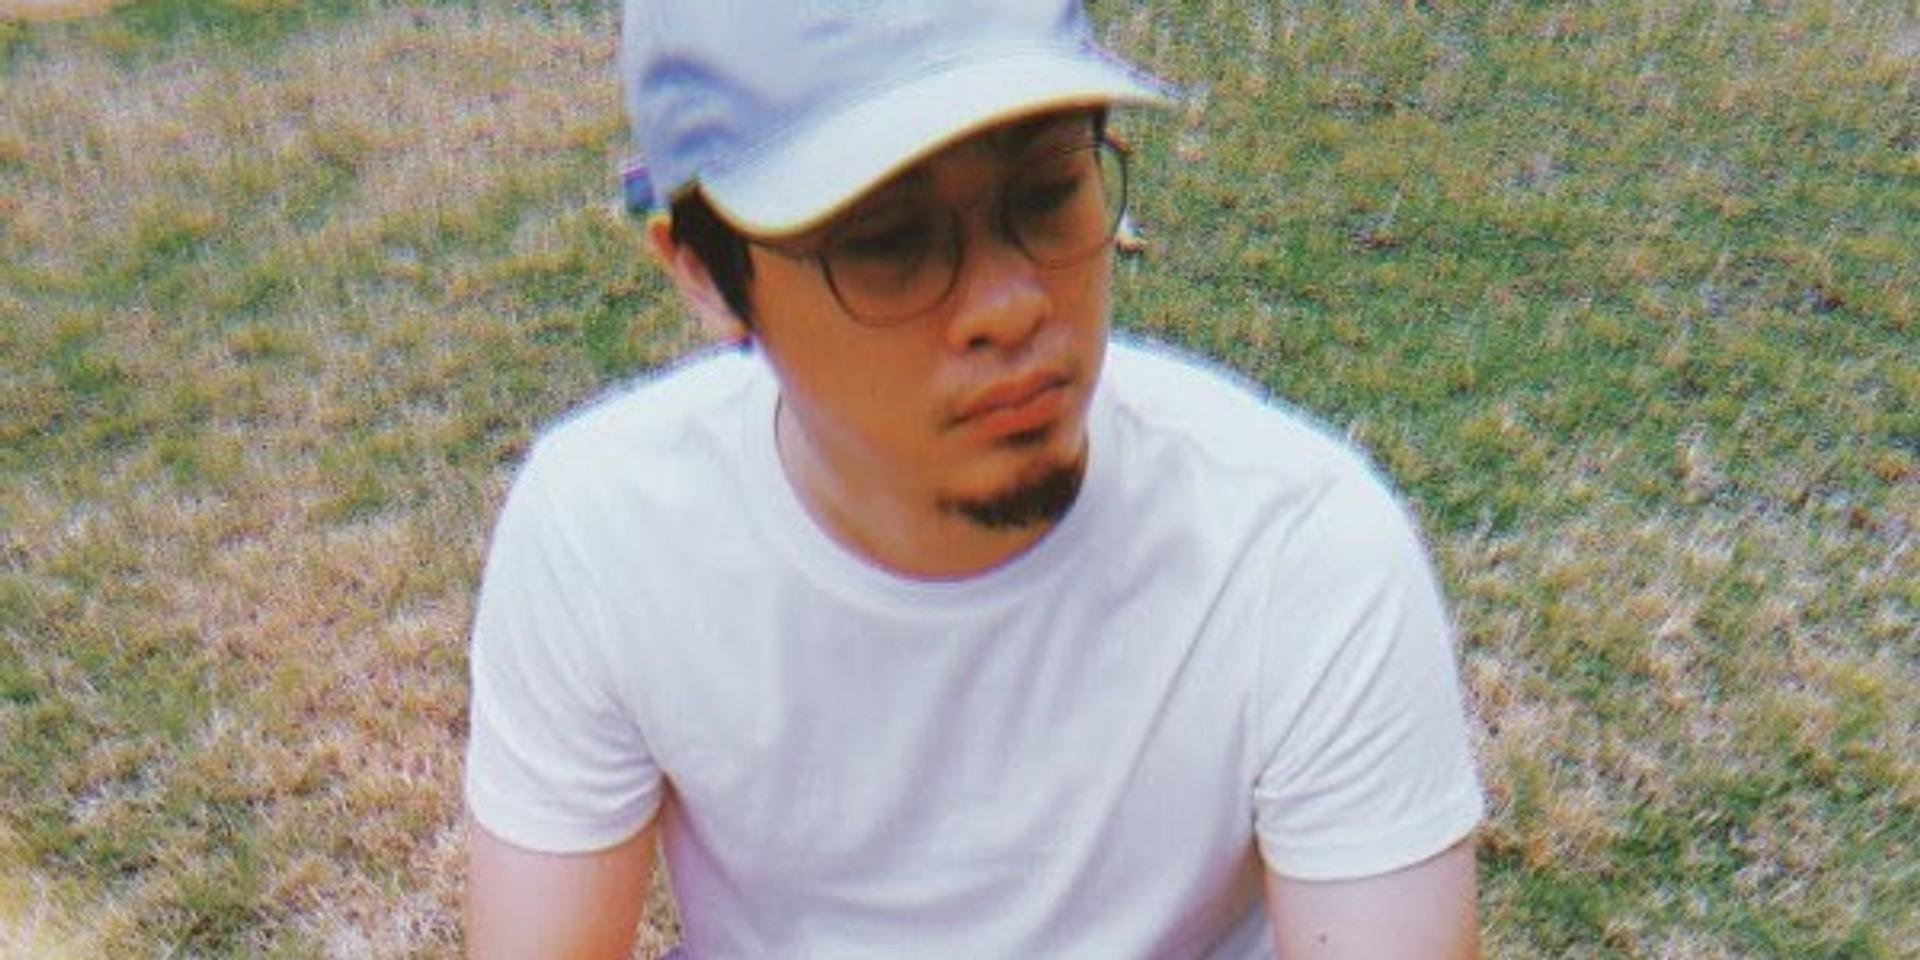 Nights of Rizal to launch debut album summer/salt